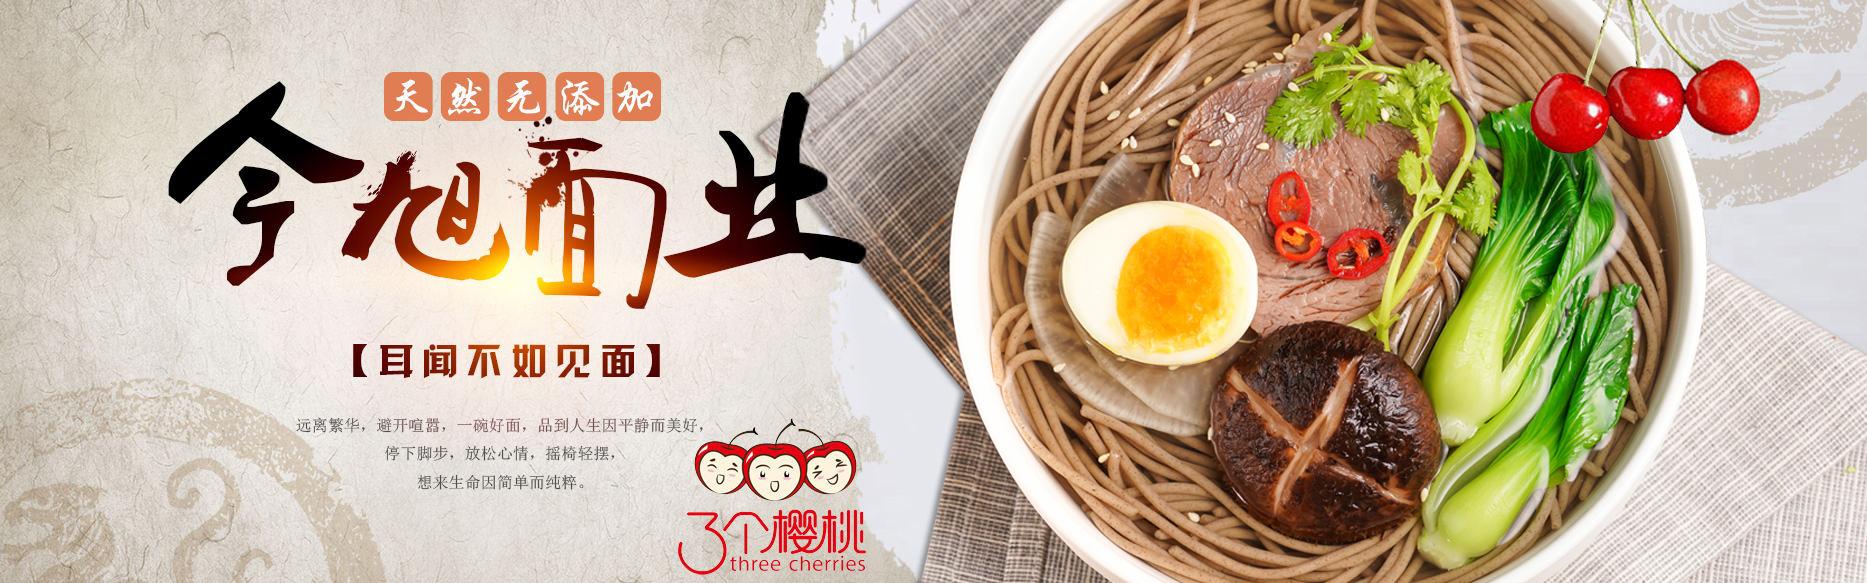 http://www.jinxumianye.com/data/upload/202109/20210909175447_556.jpg